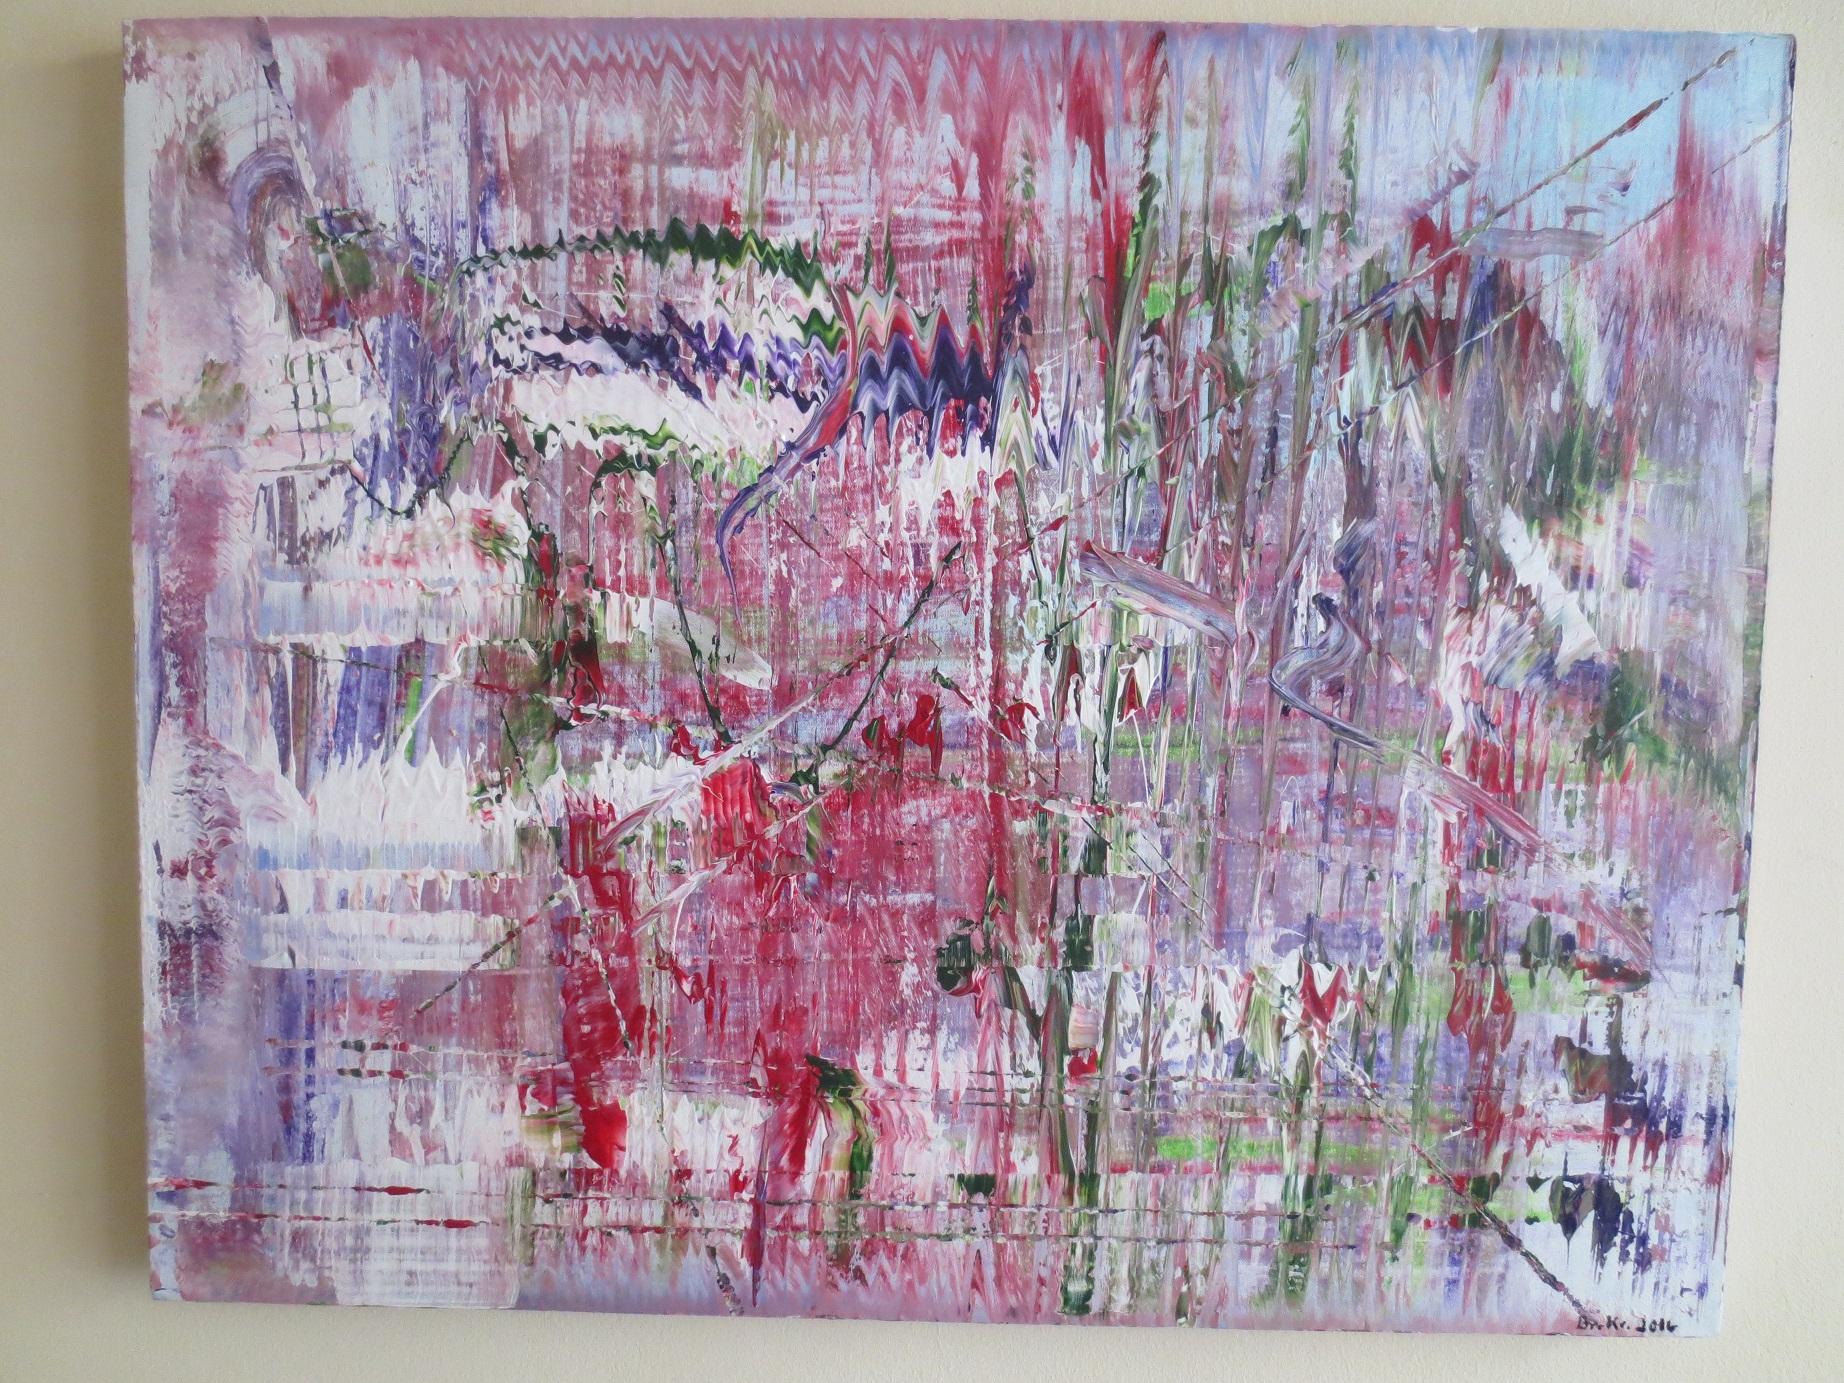 5-2016 80x100 Acryl auf Leinwand (2)